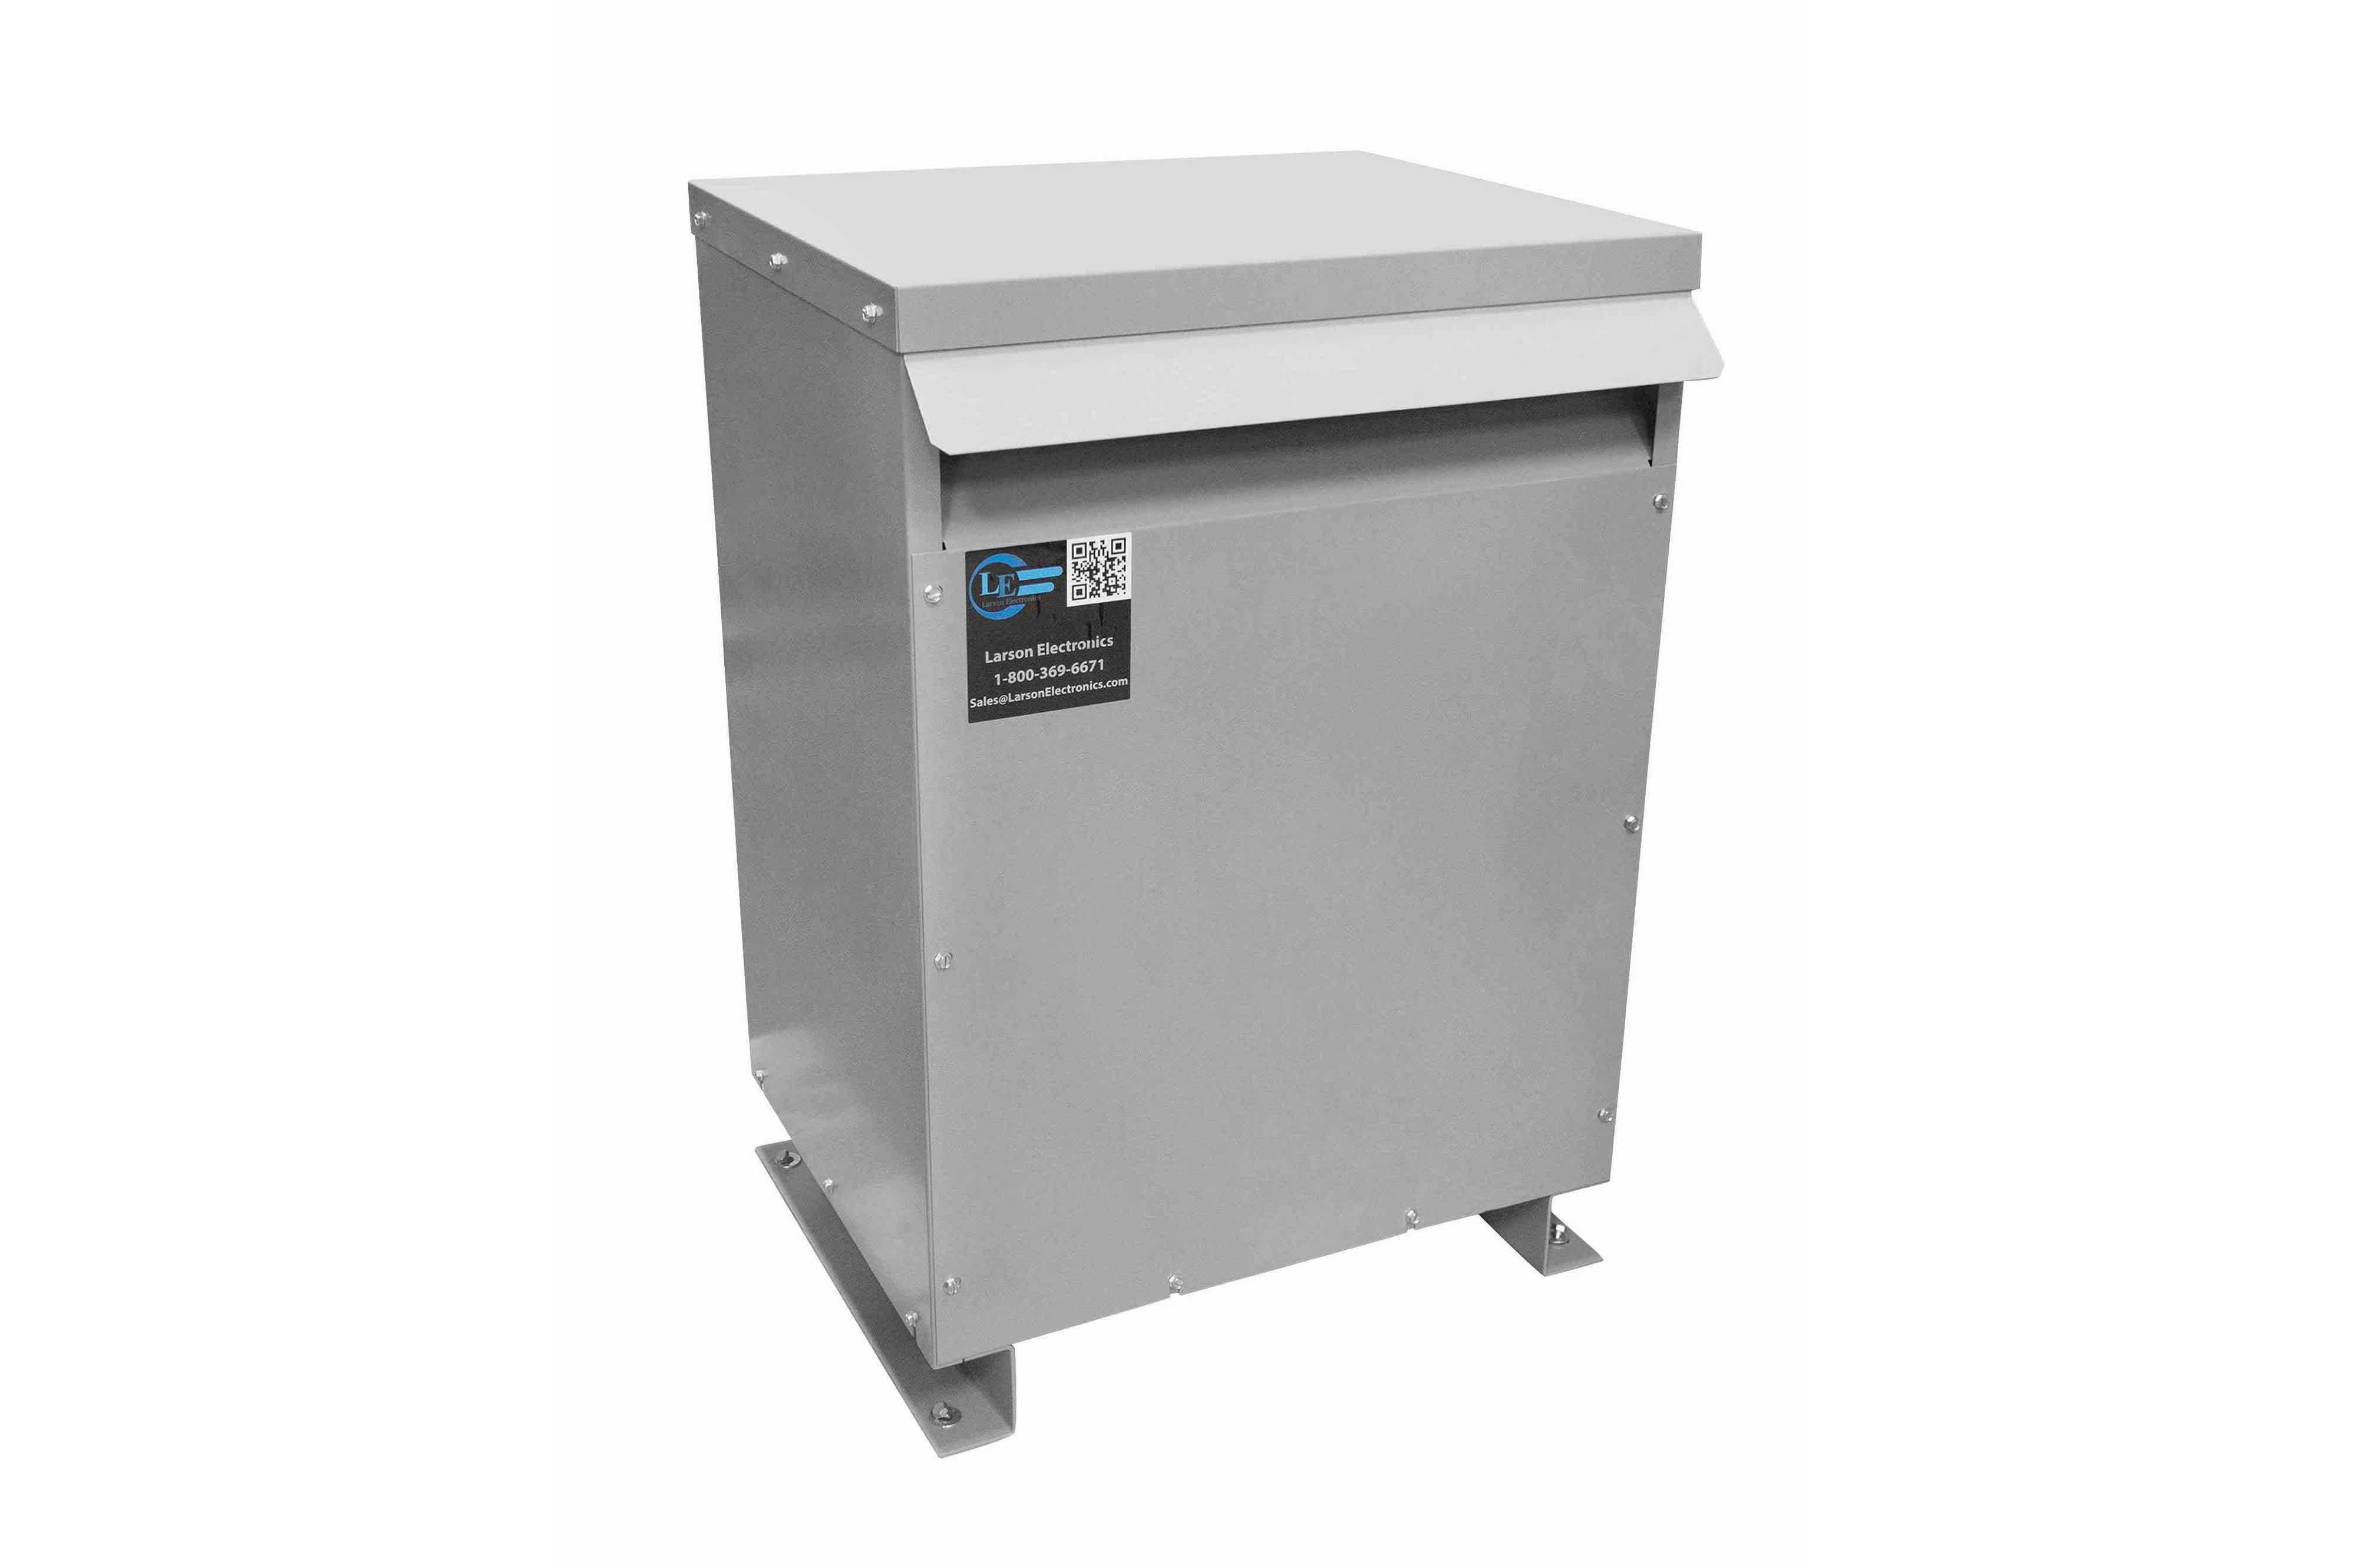 150 kVA 3PH DOE Transformer, 575V Delta Primary, 208Y/120 Wye-N Secondary, N3R, Ventilated, 60 Hz